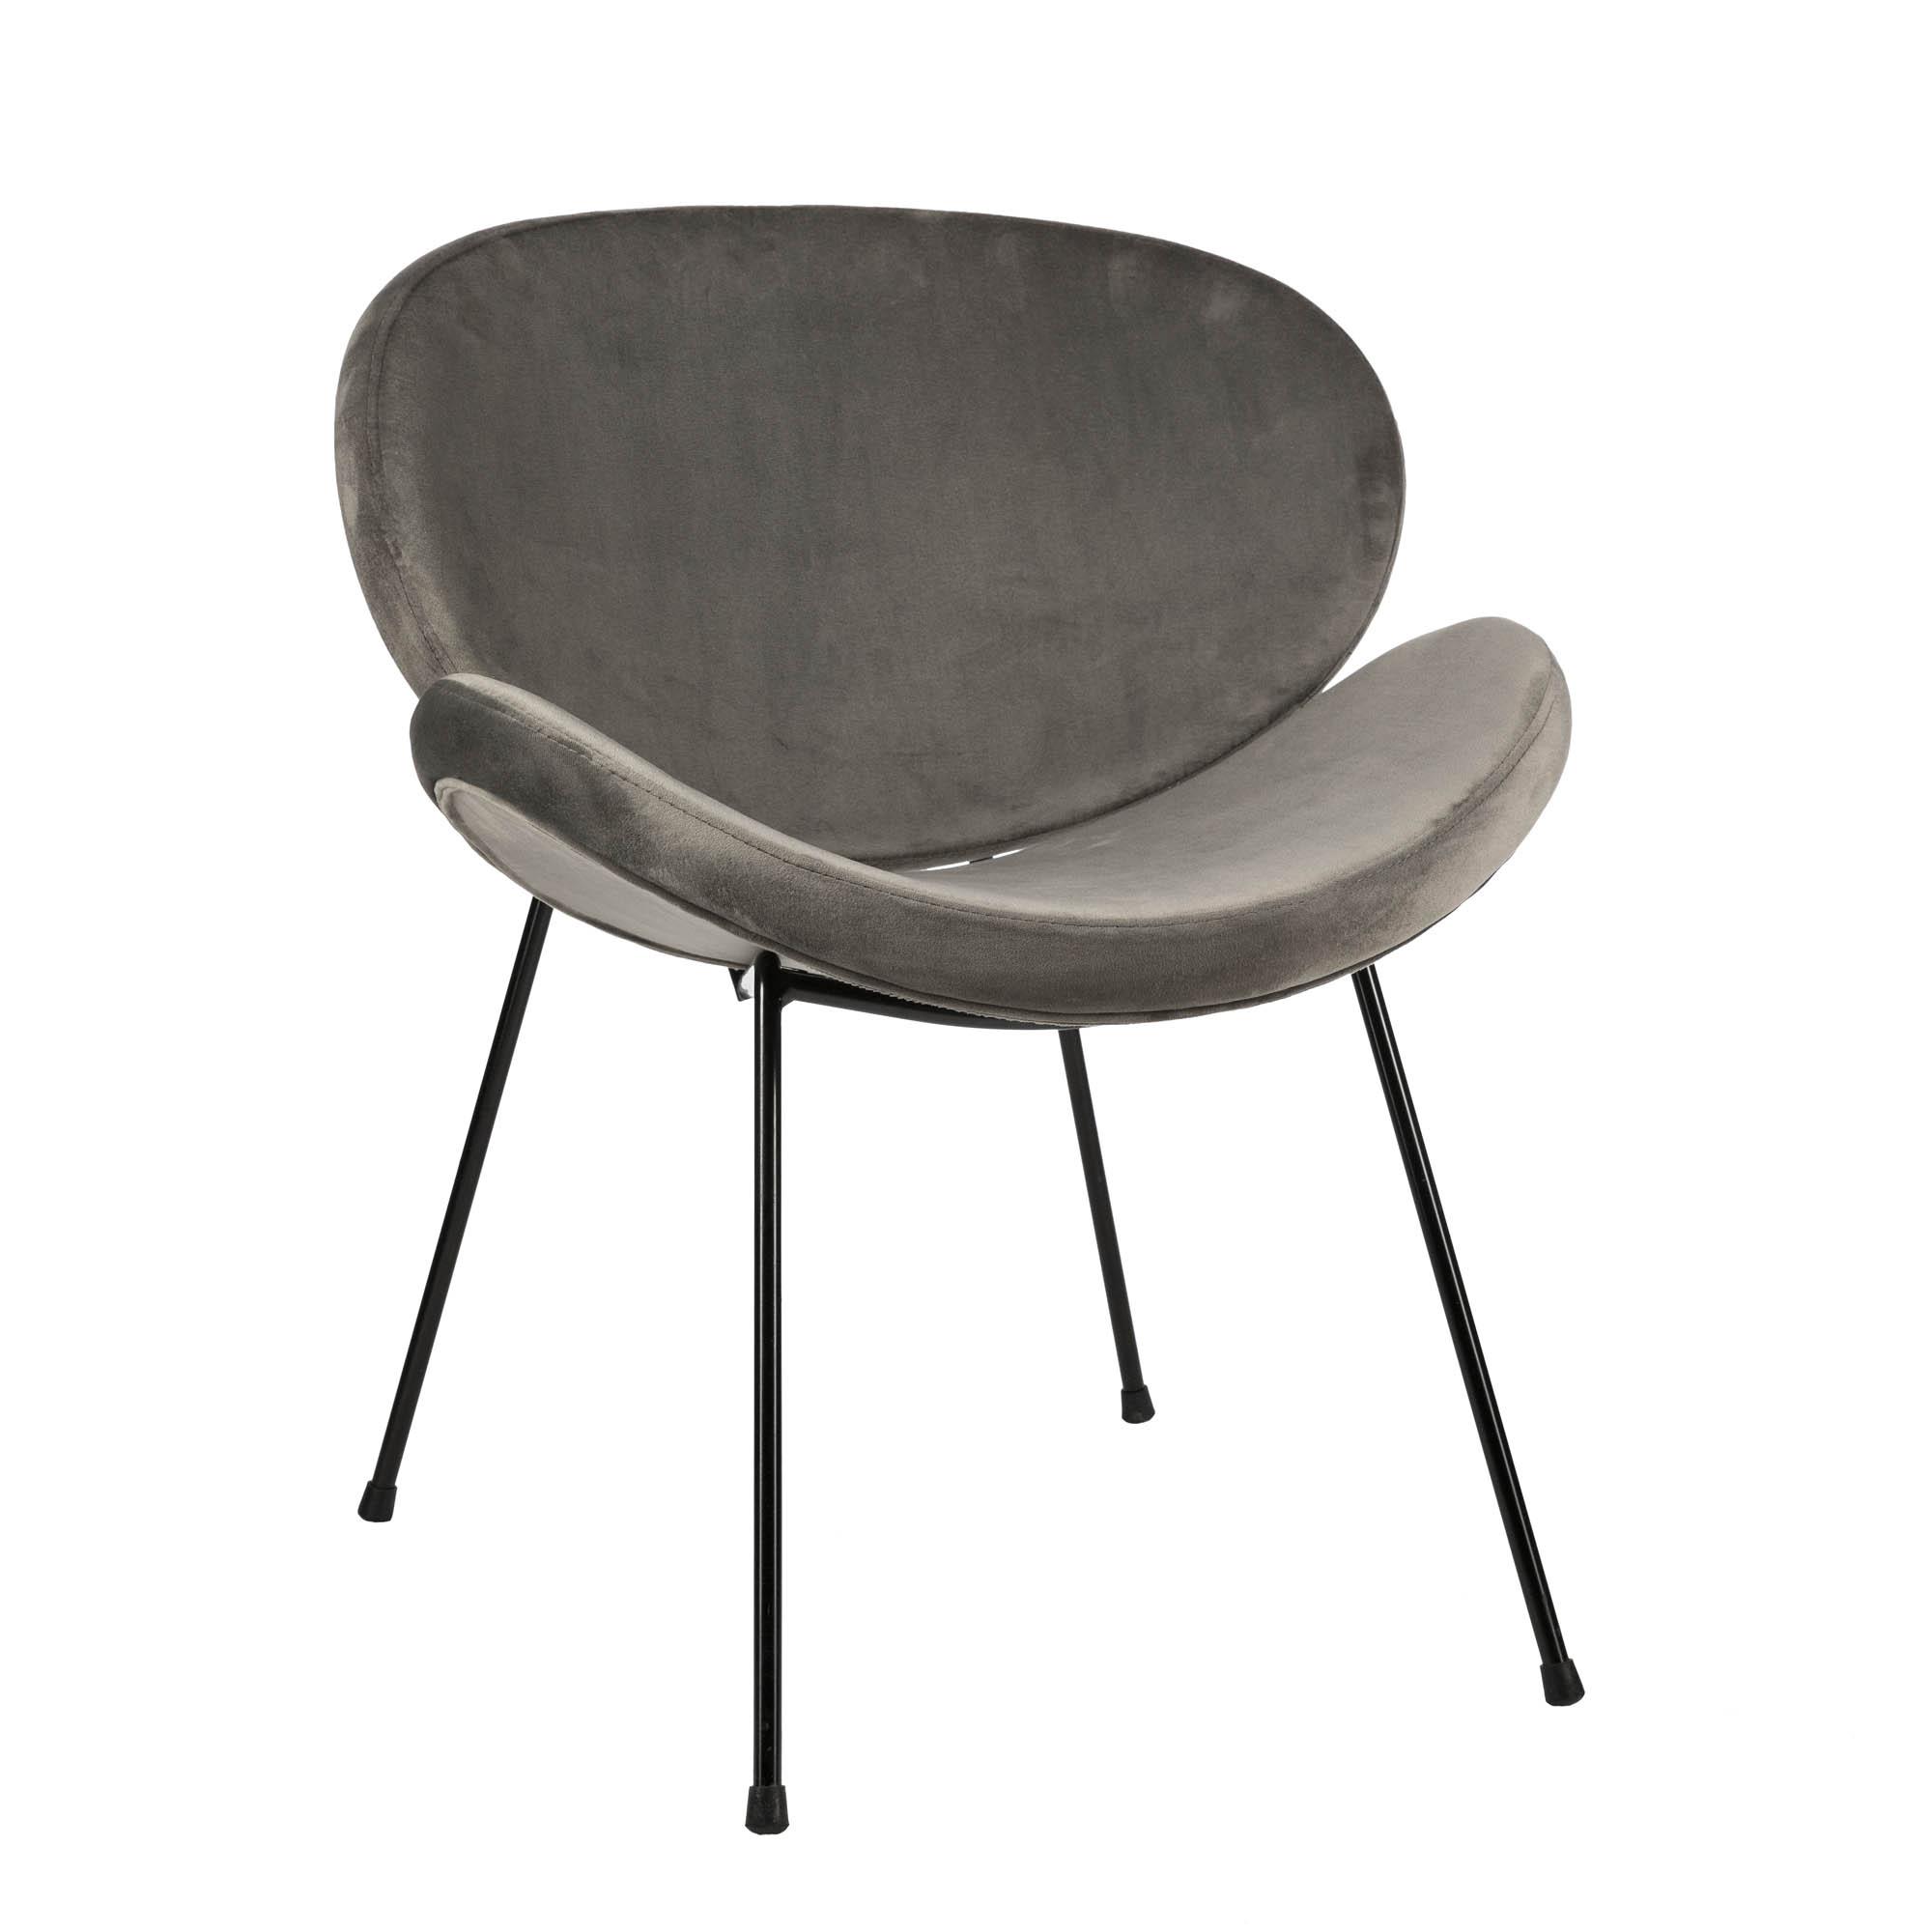 Produktfoto av stol.